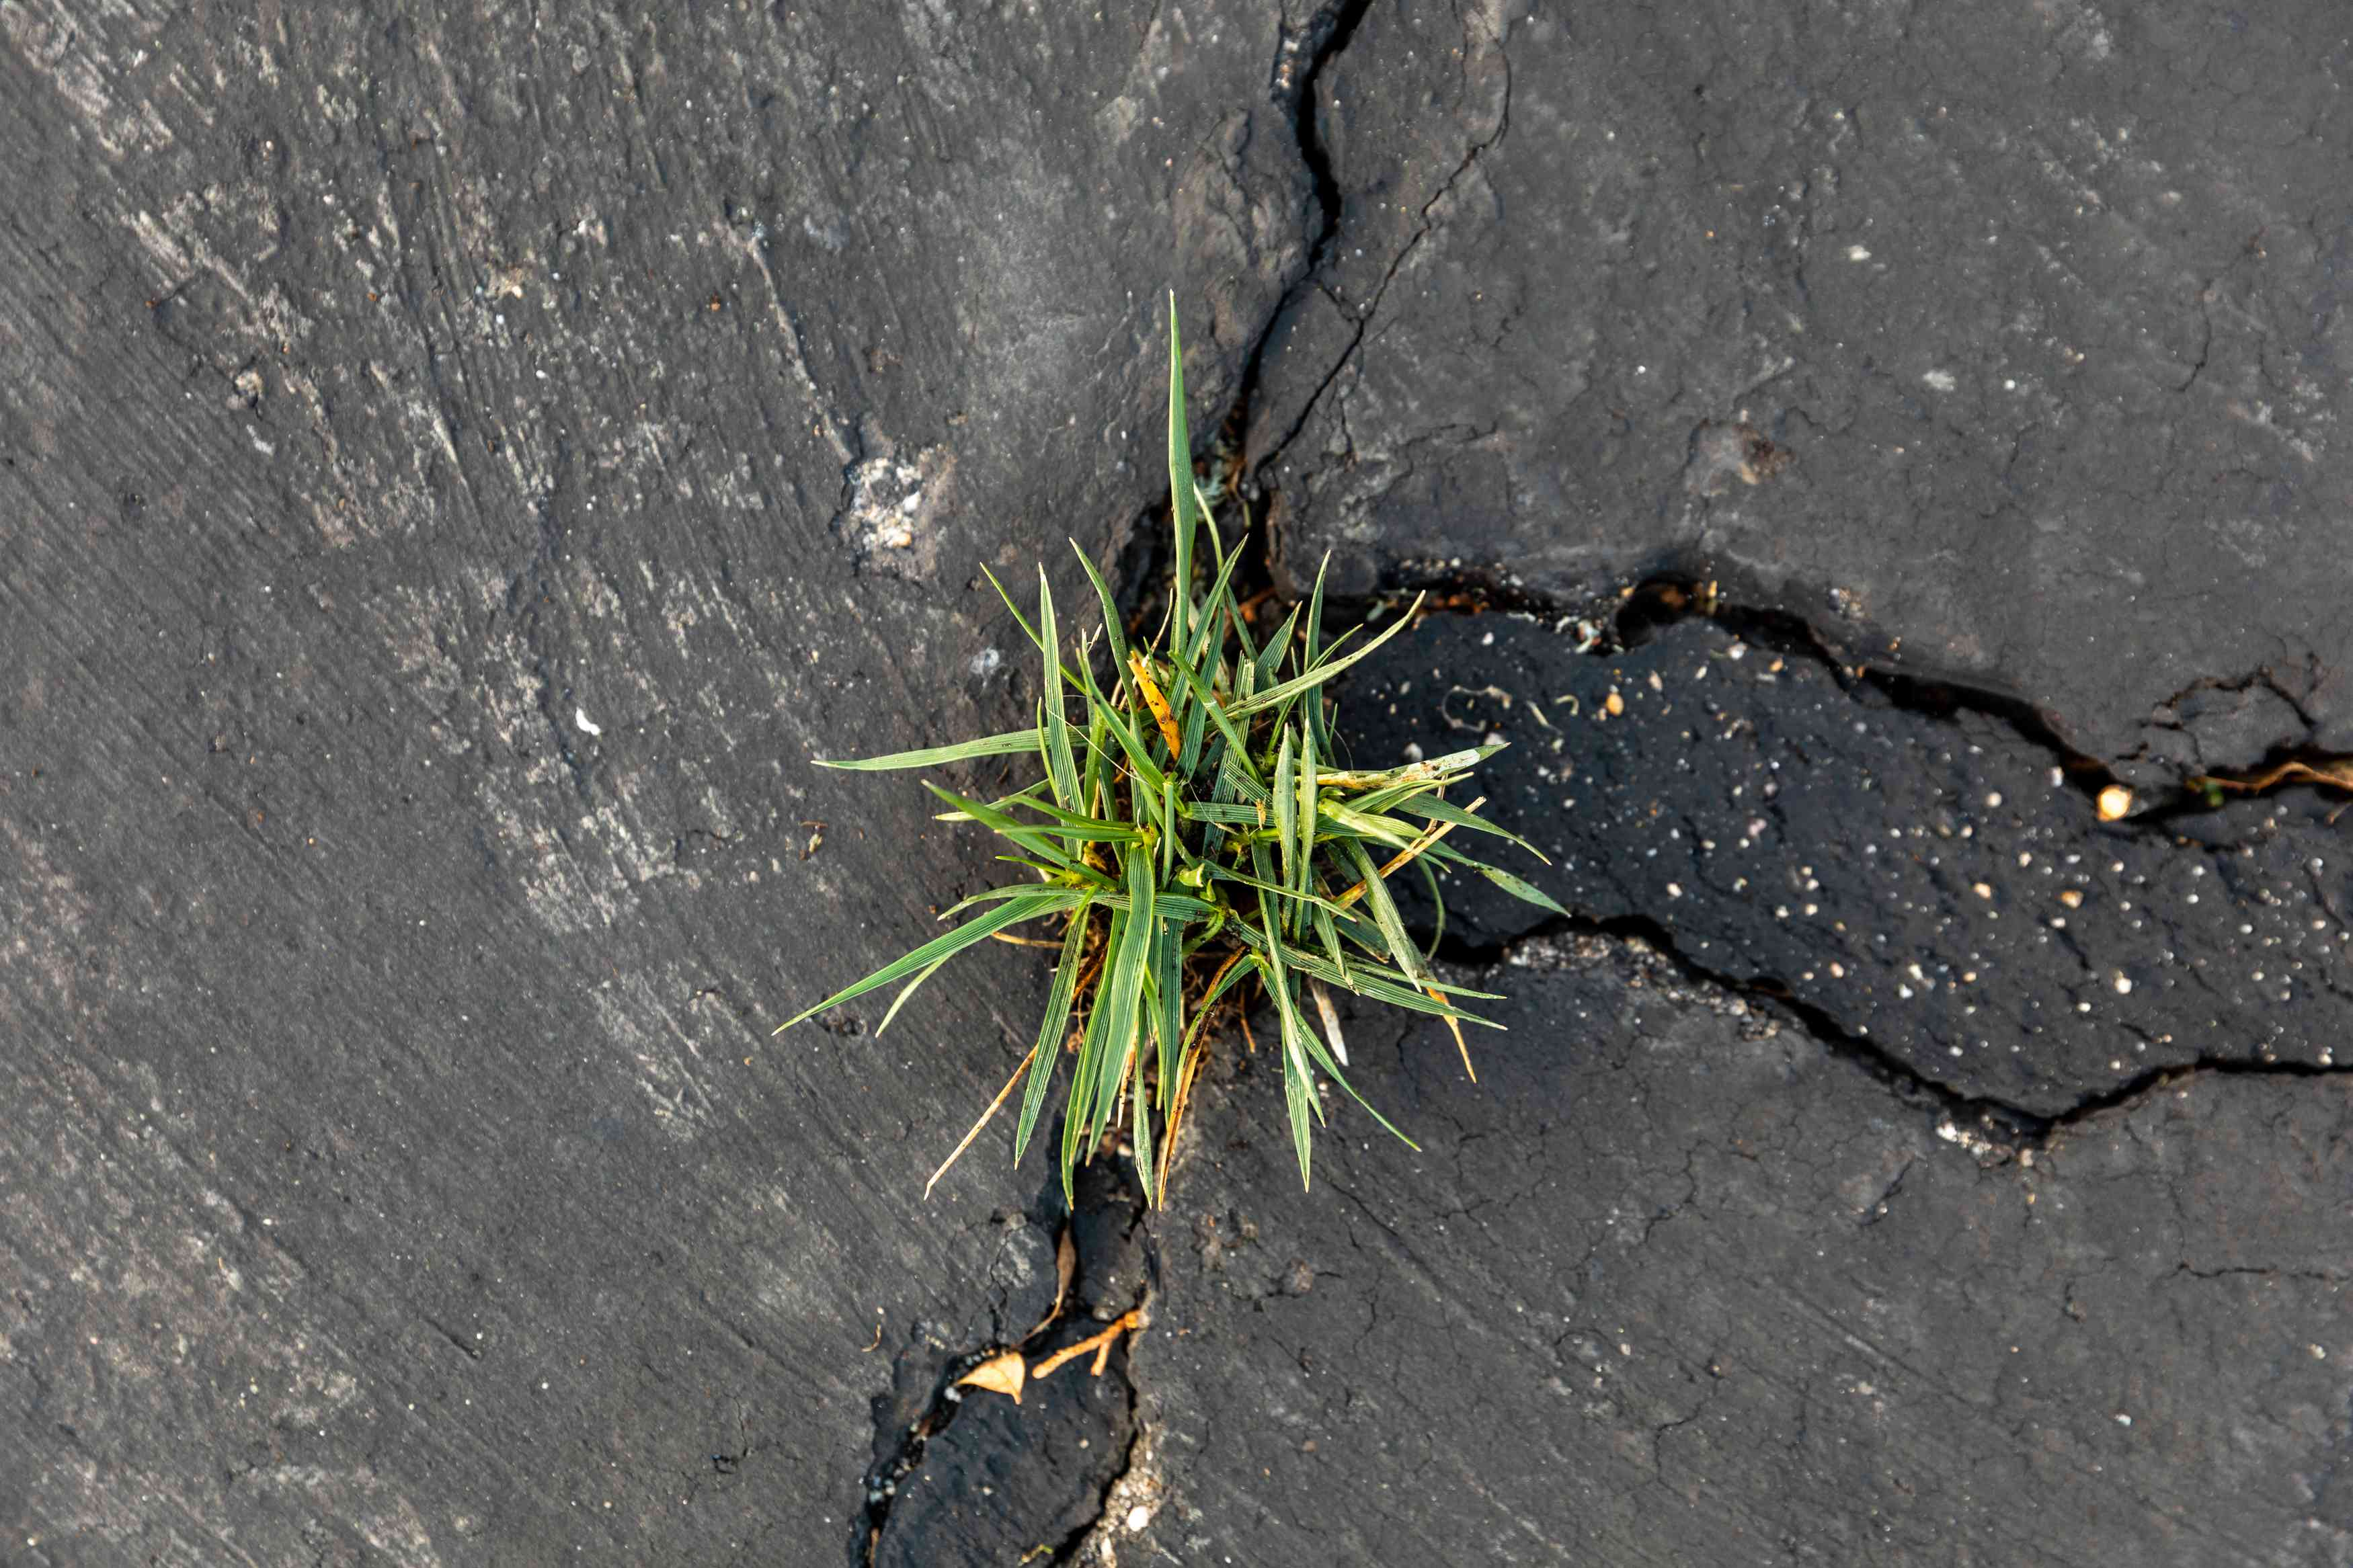 Grass growing through black sidewalk crack from above